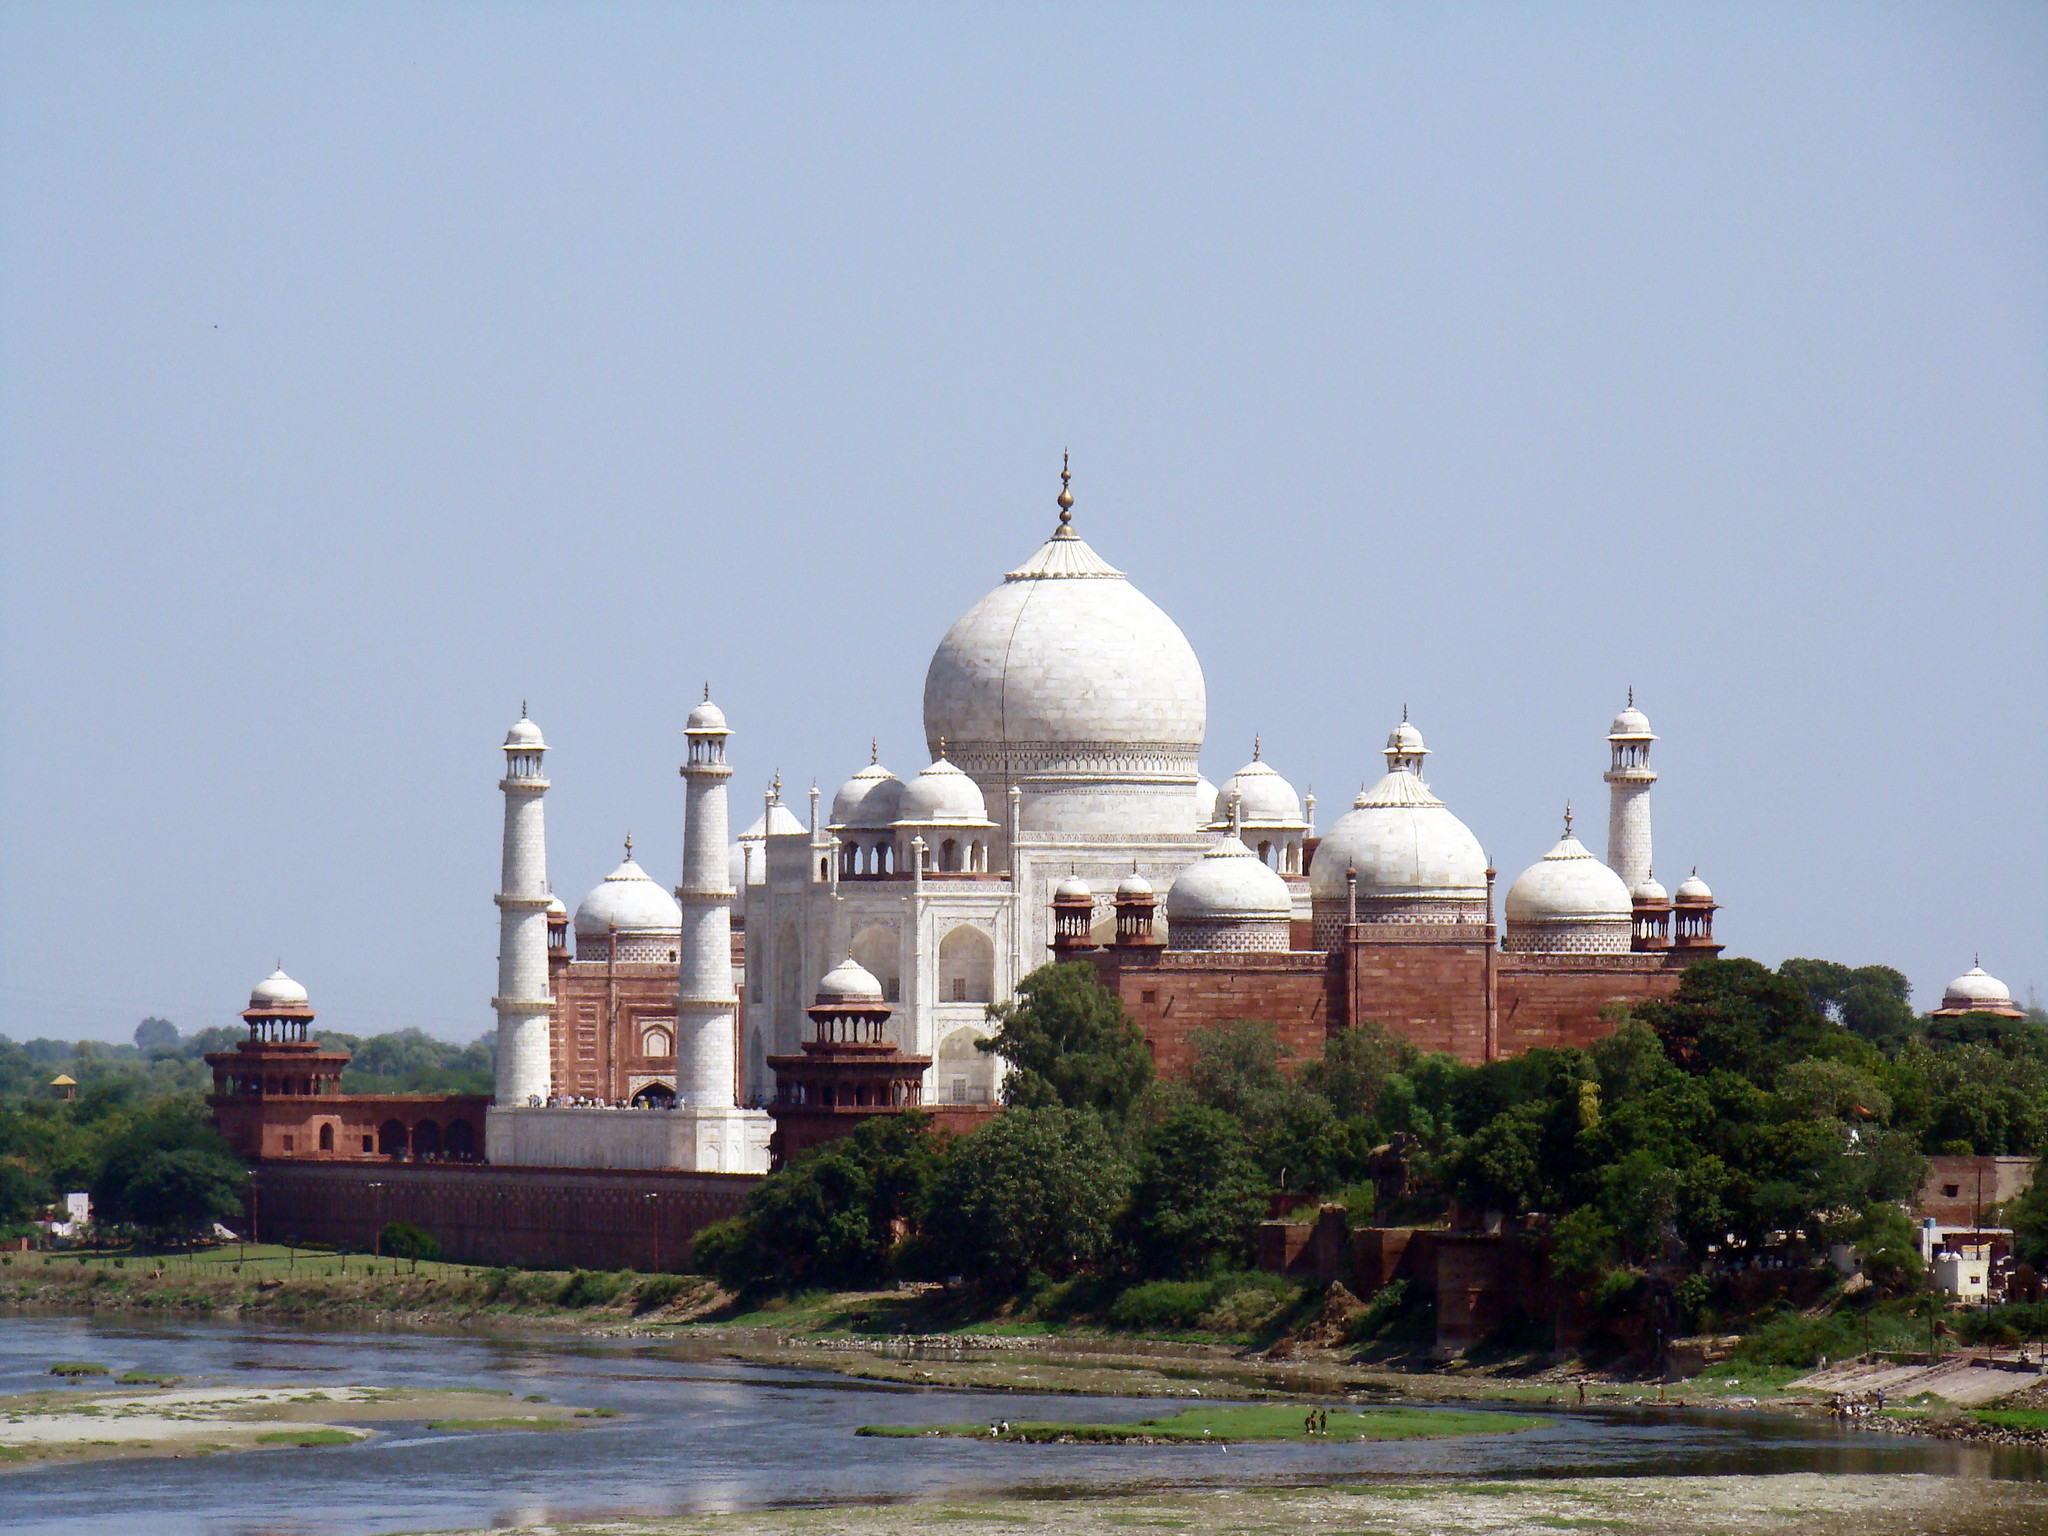 río Yamuna y vista del mausoleo Taj Mahal Agra India